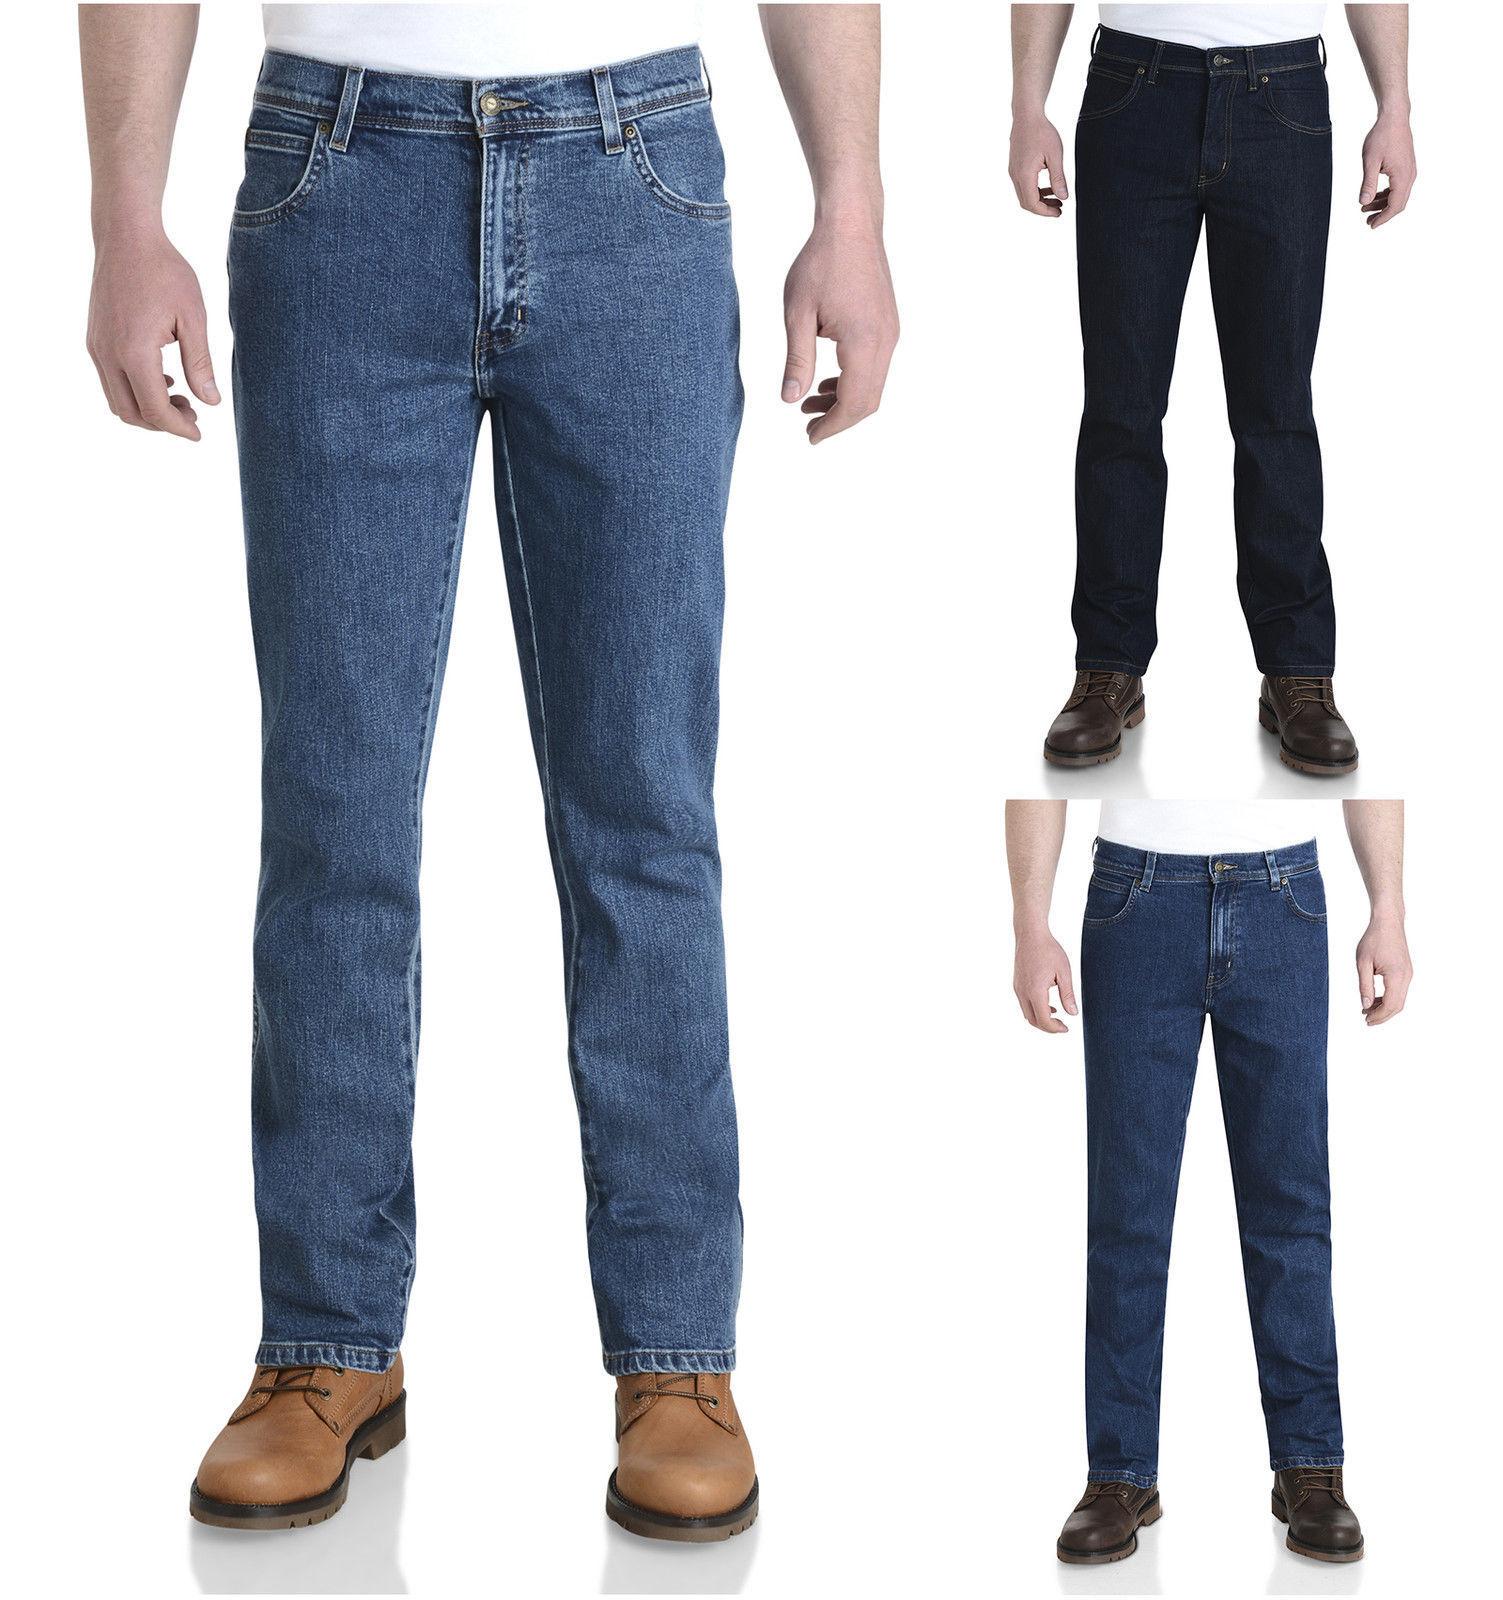 Wrangler Durevoli Stretch Denim Jeans men Straight Fit  Darkstone Stonewash